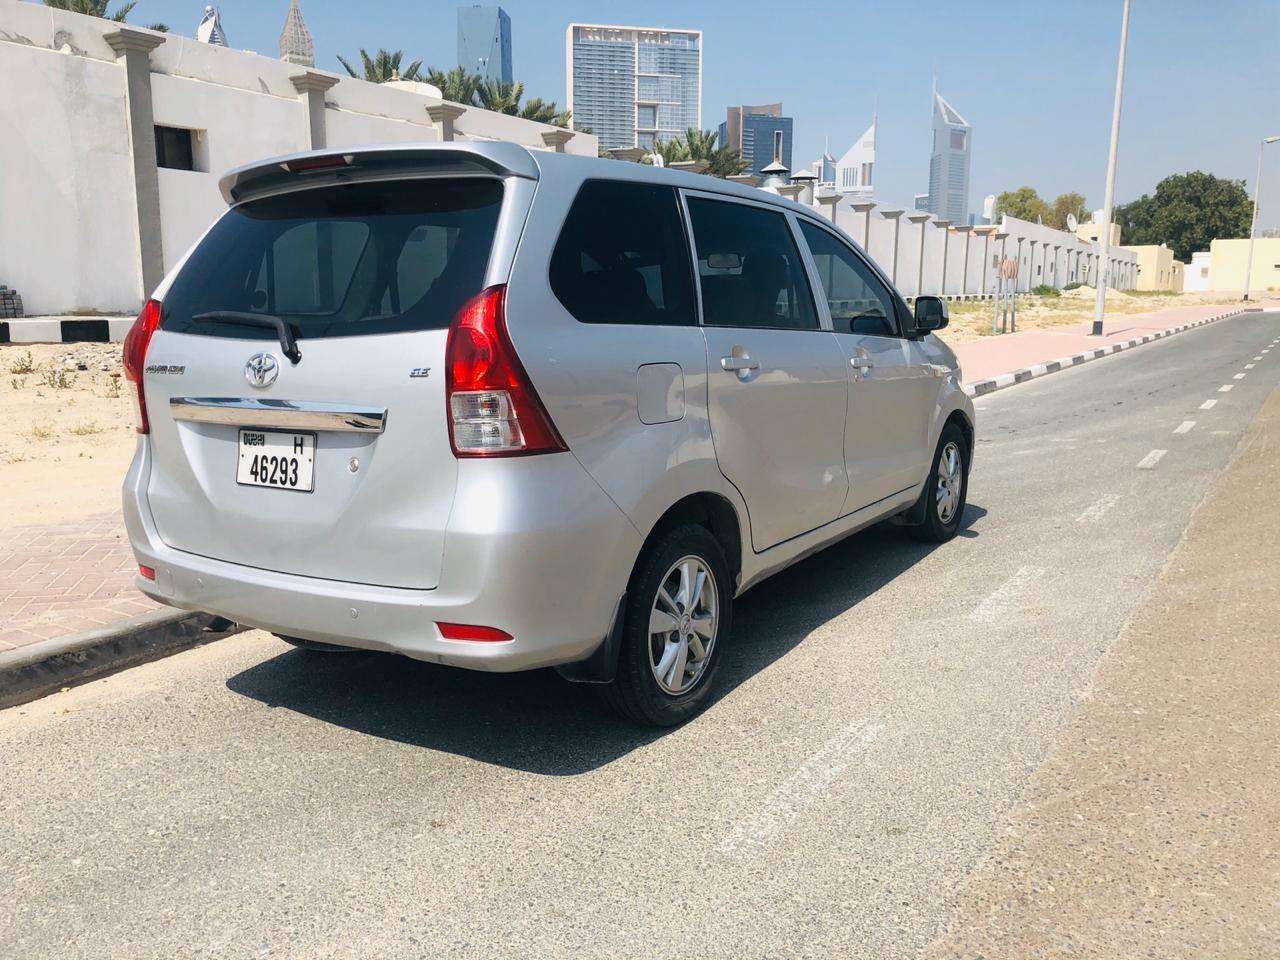 Kekurangan Toyota Avanza 2015 Top Model Tahun Ini